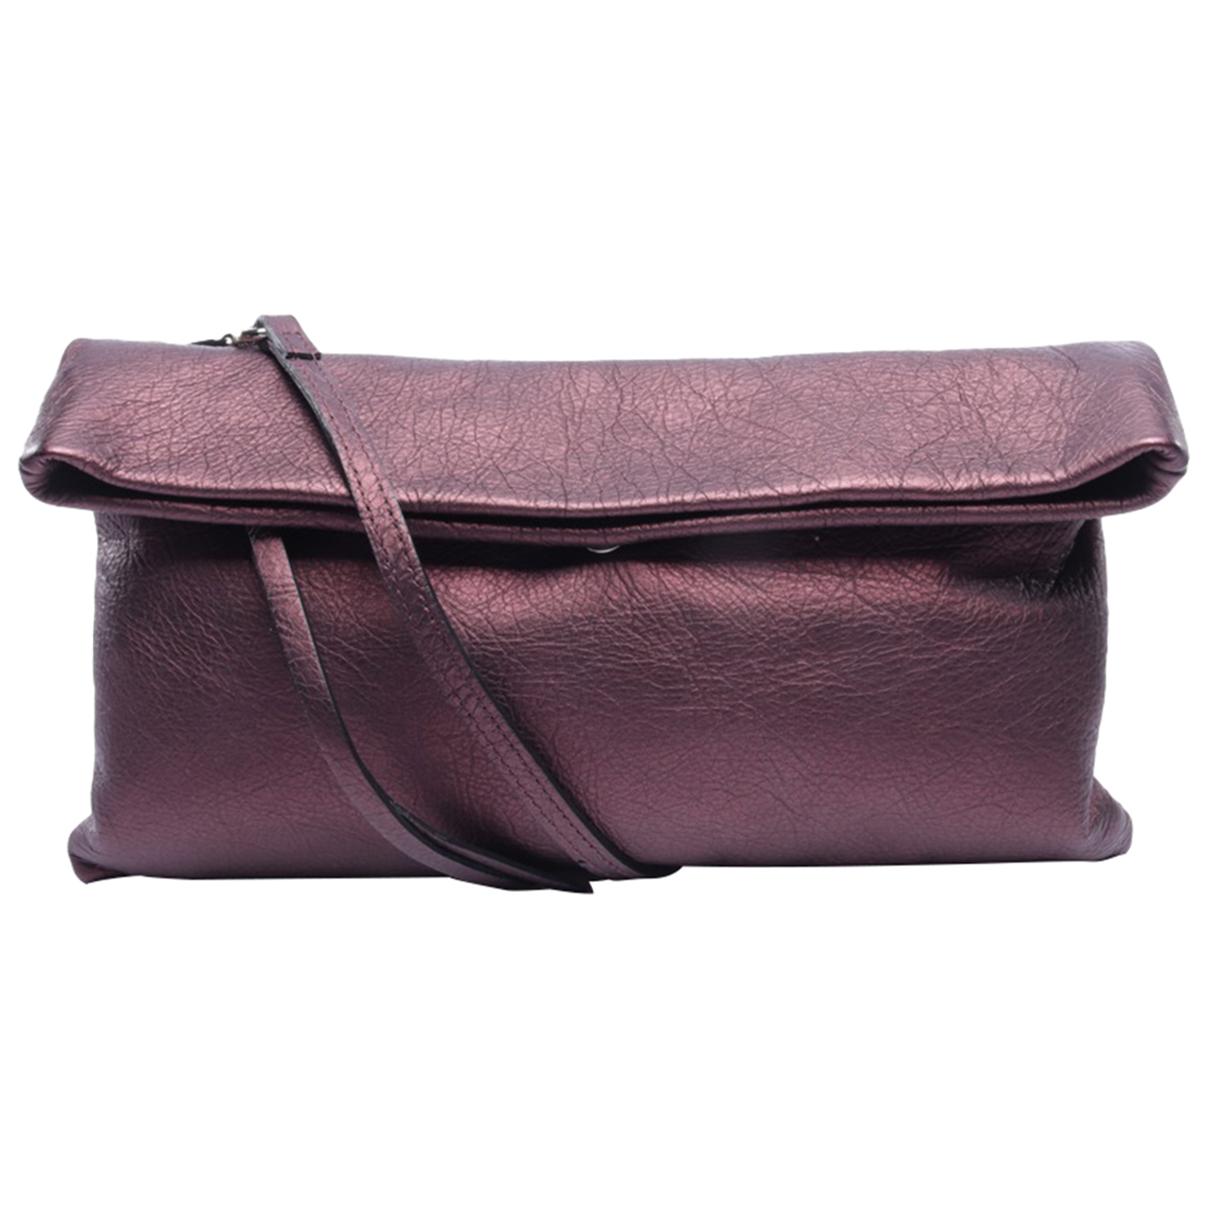 Gianni Chiarini N Leather handbag for Women N